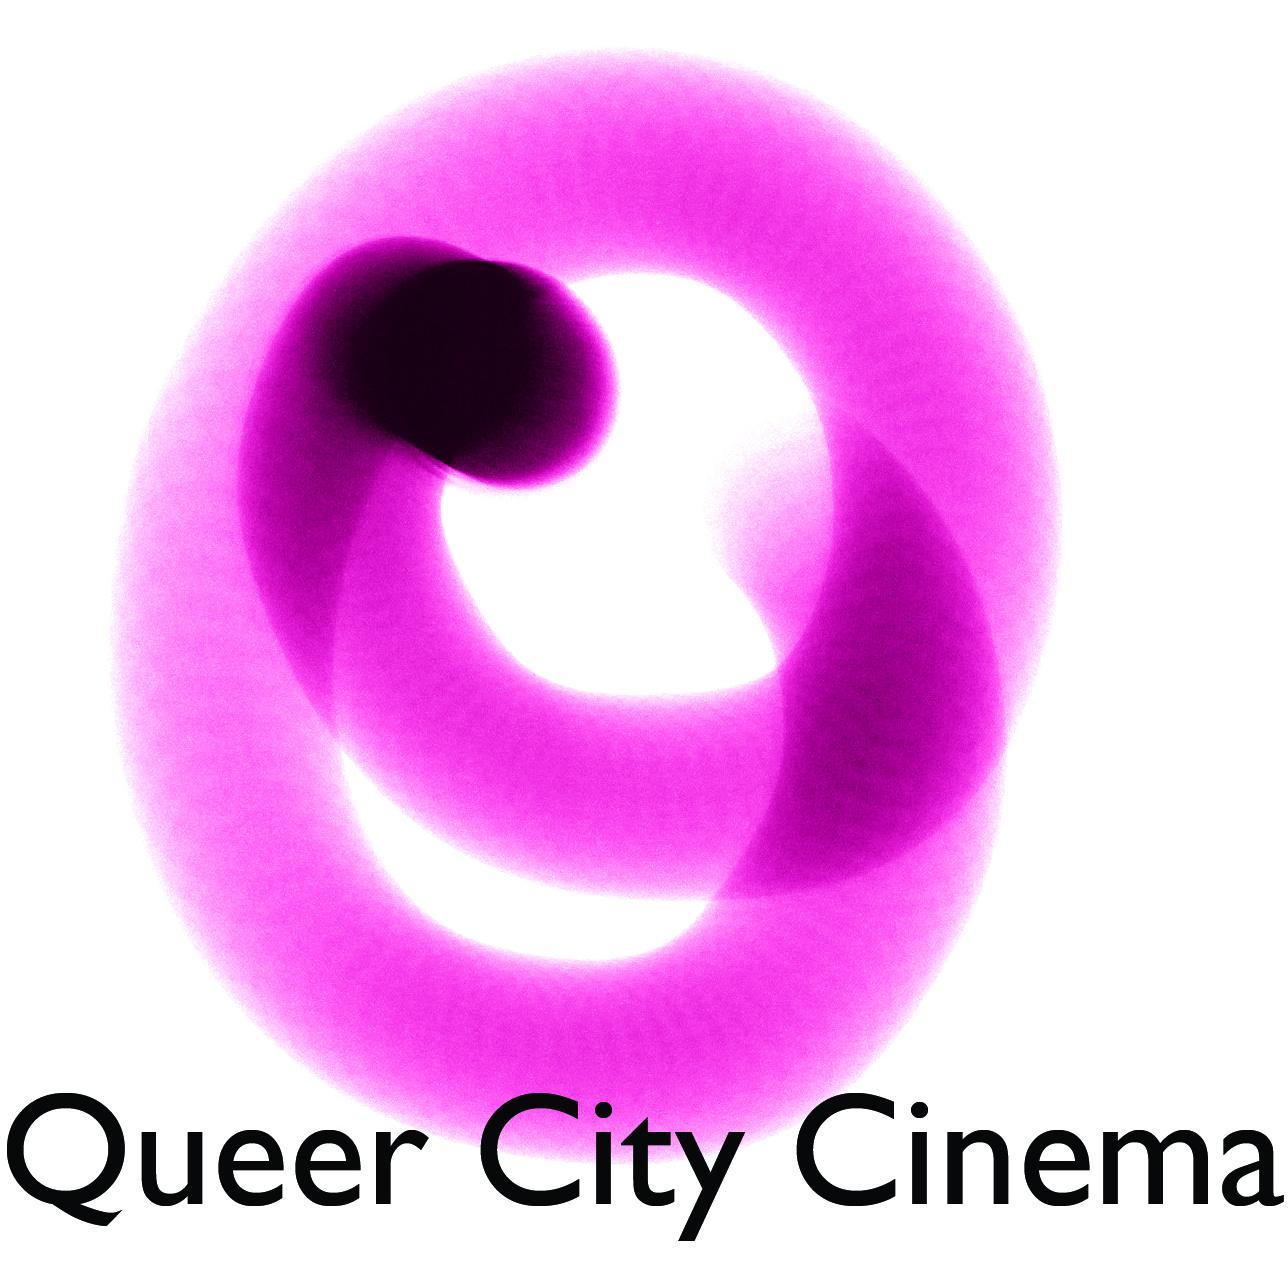 Queer City Cinema